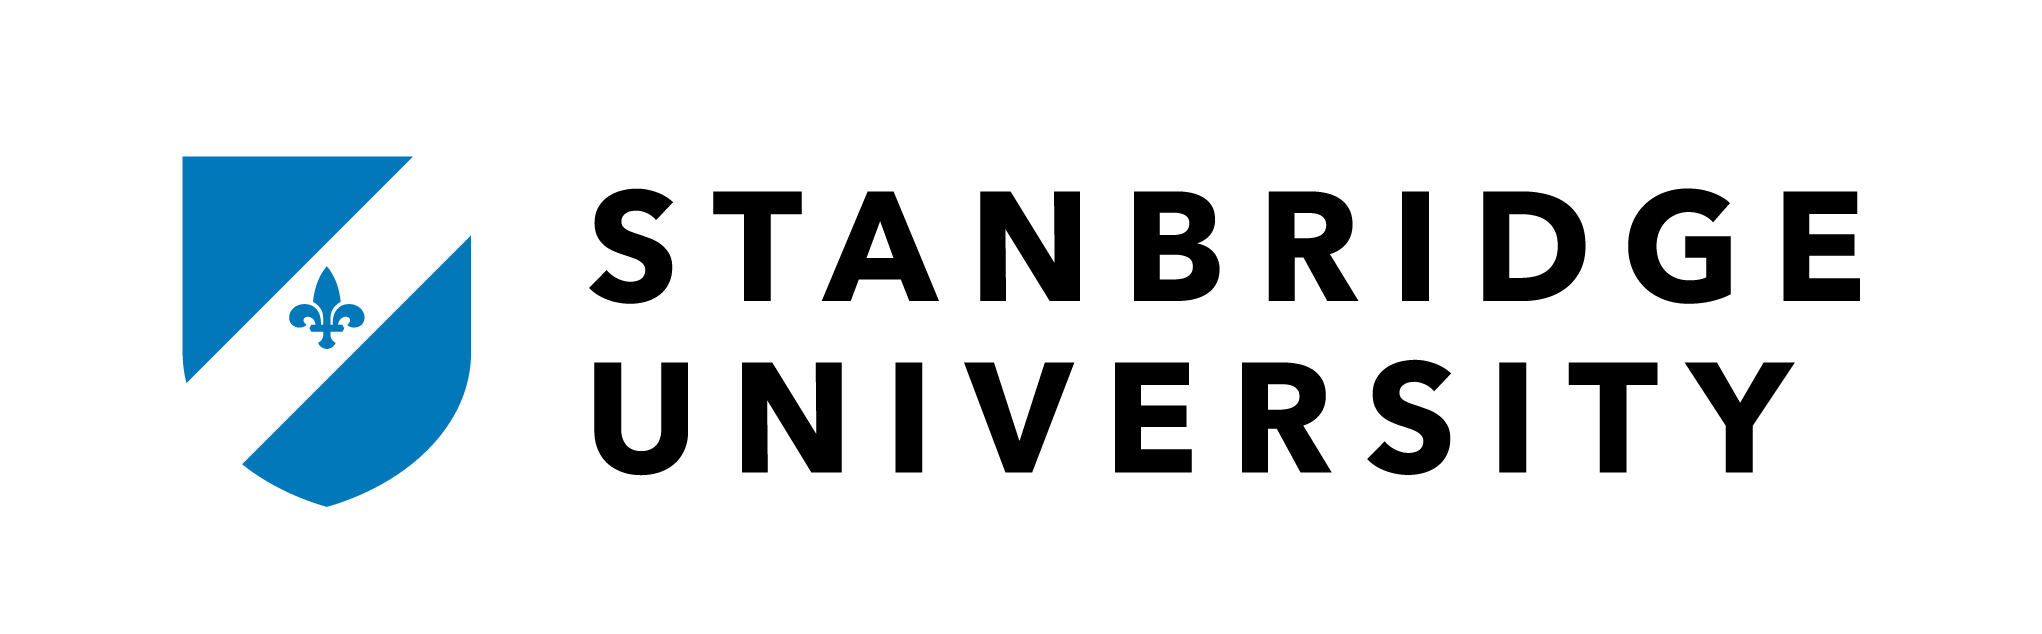 stanbridgecollege Logo